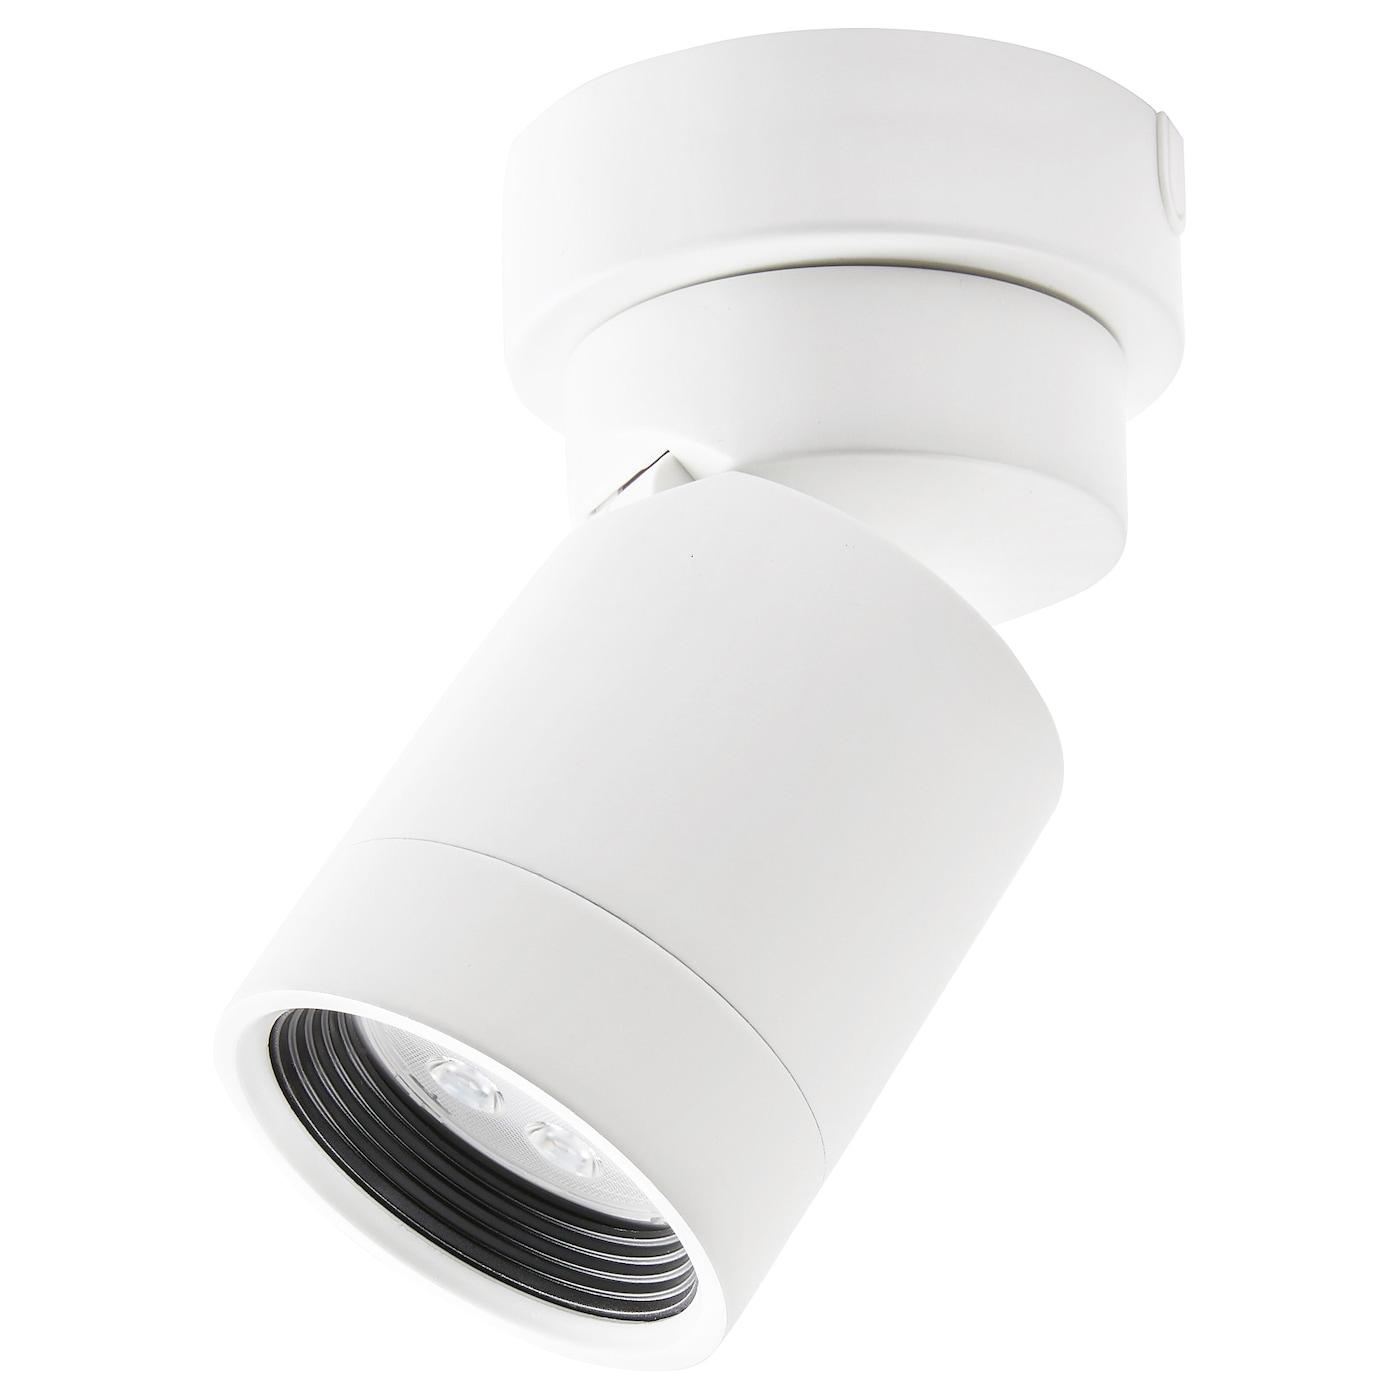 Nymane مصباح سقف موجه مع مصباح موجه واحد أبيض ايكيا